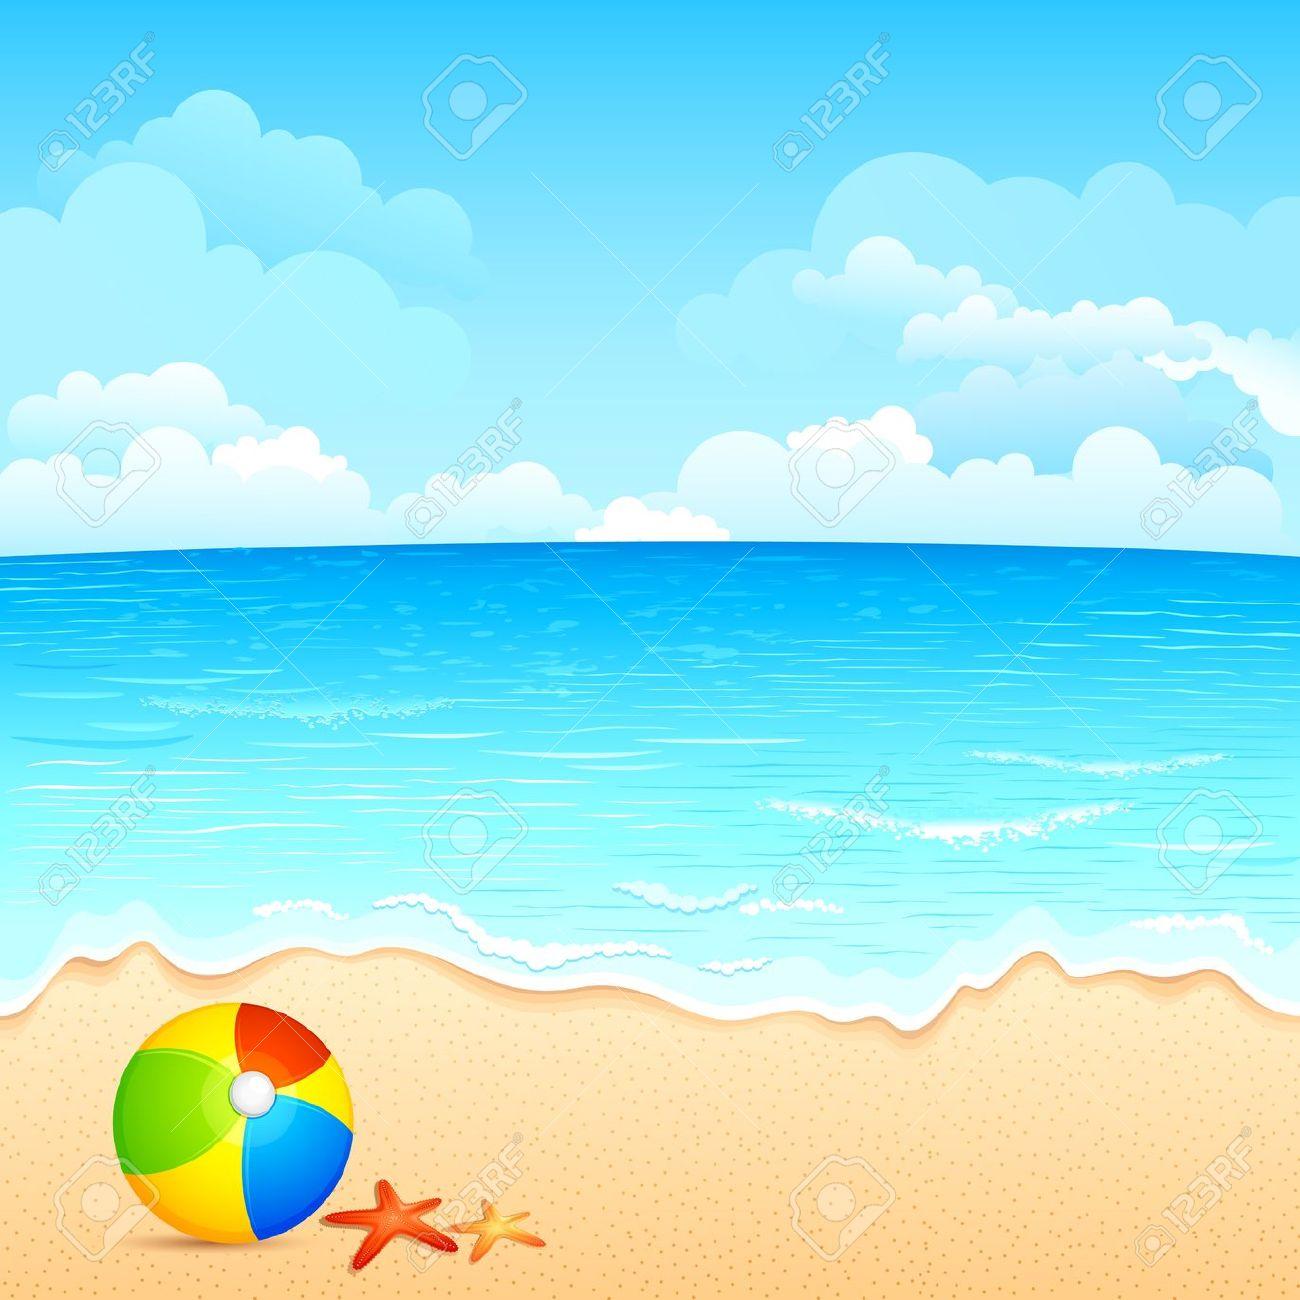 Beach Clipart Free Clipart .-Beach clipart free clipart .-6